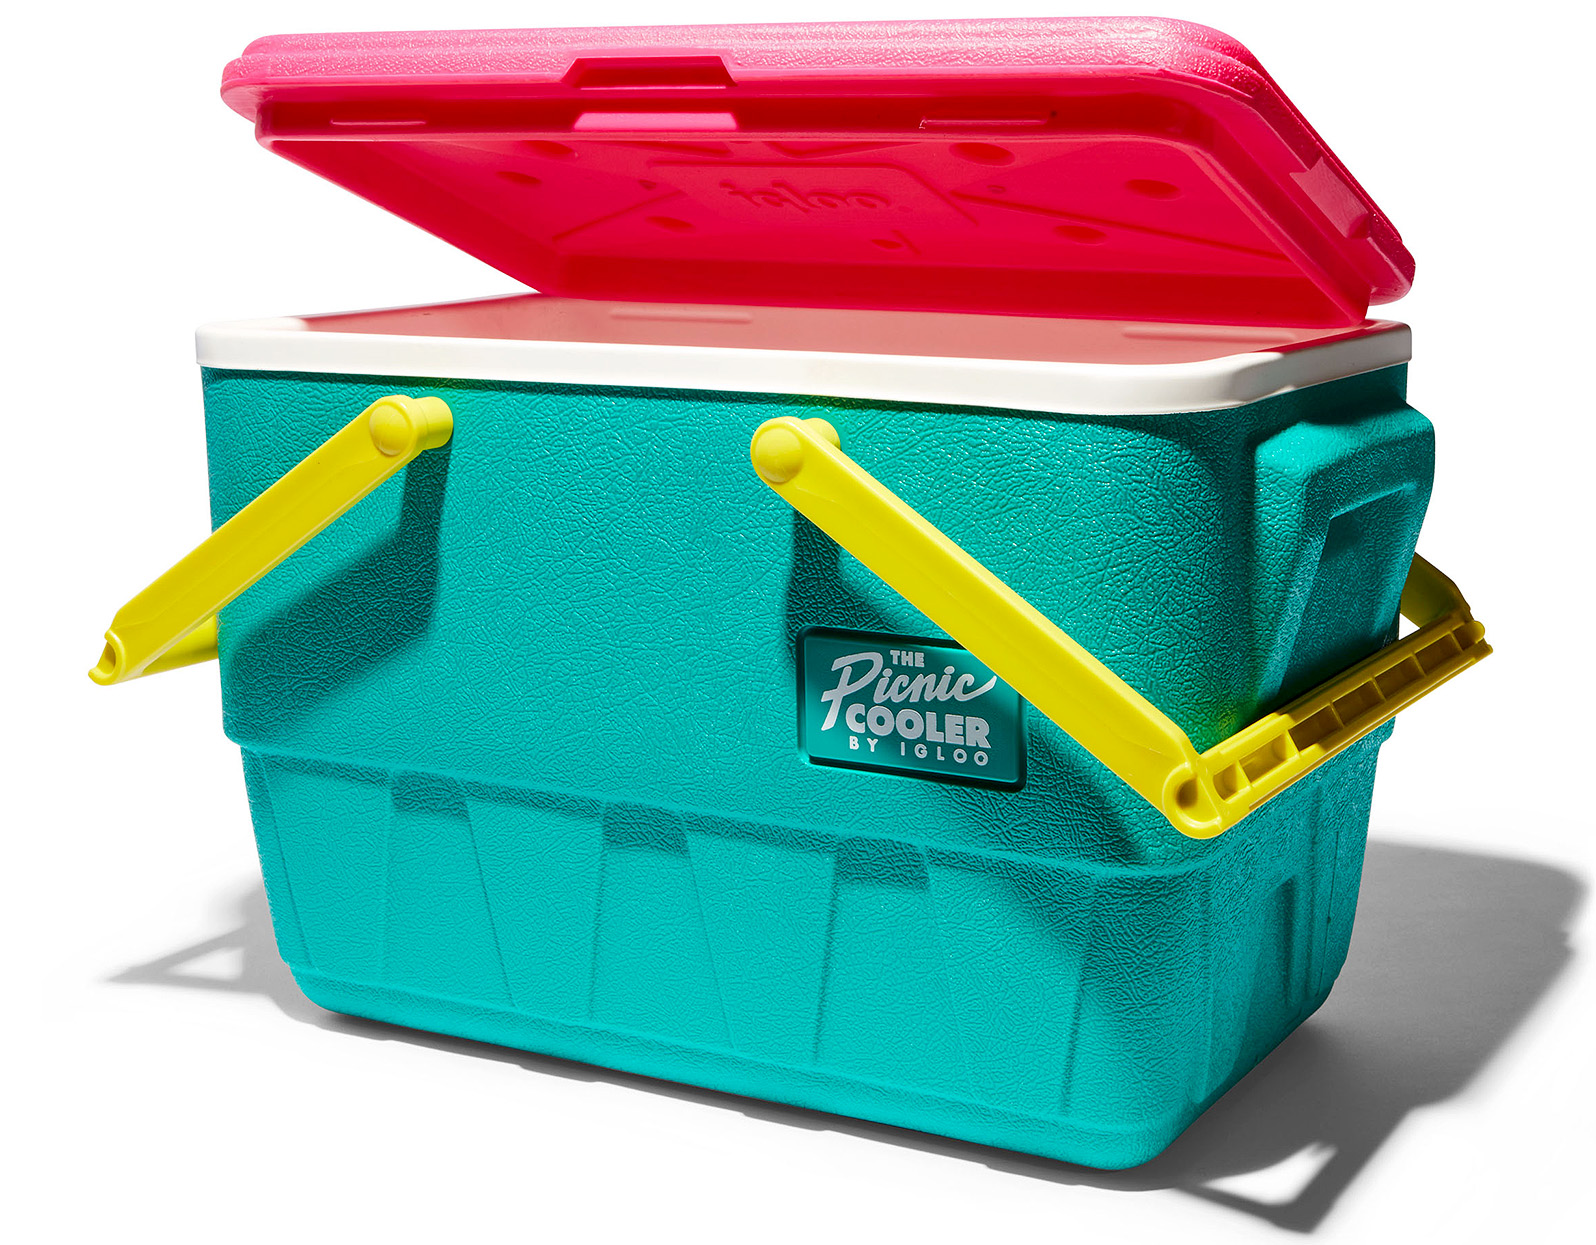 retro colorful Igloo picnic cooler